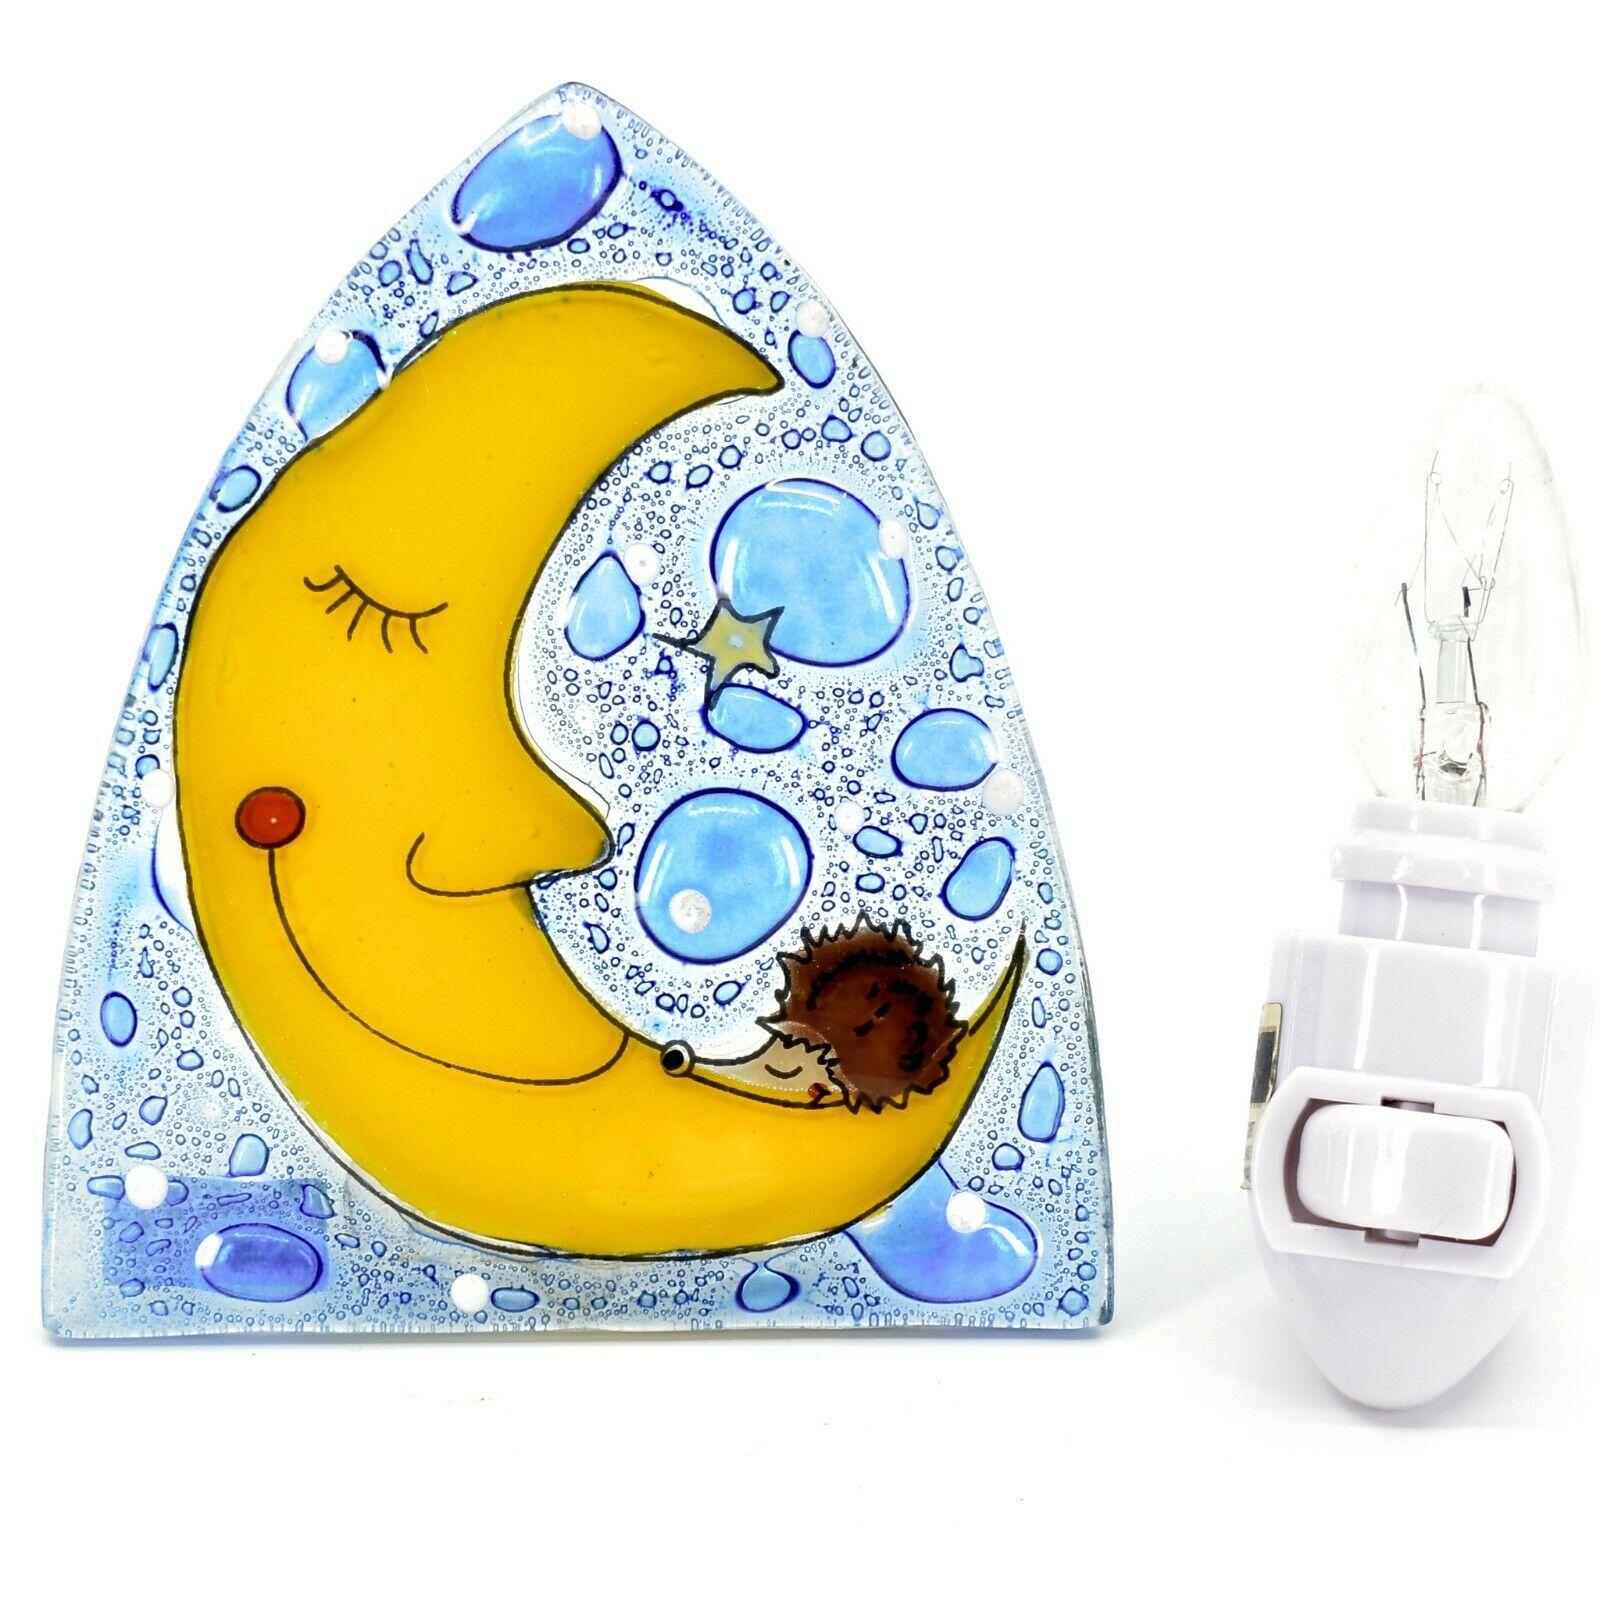 Fused Art Glass Hedgehog Sleeping on Moon Design Night Light Handmade in Ecuador